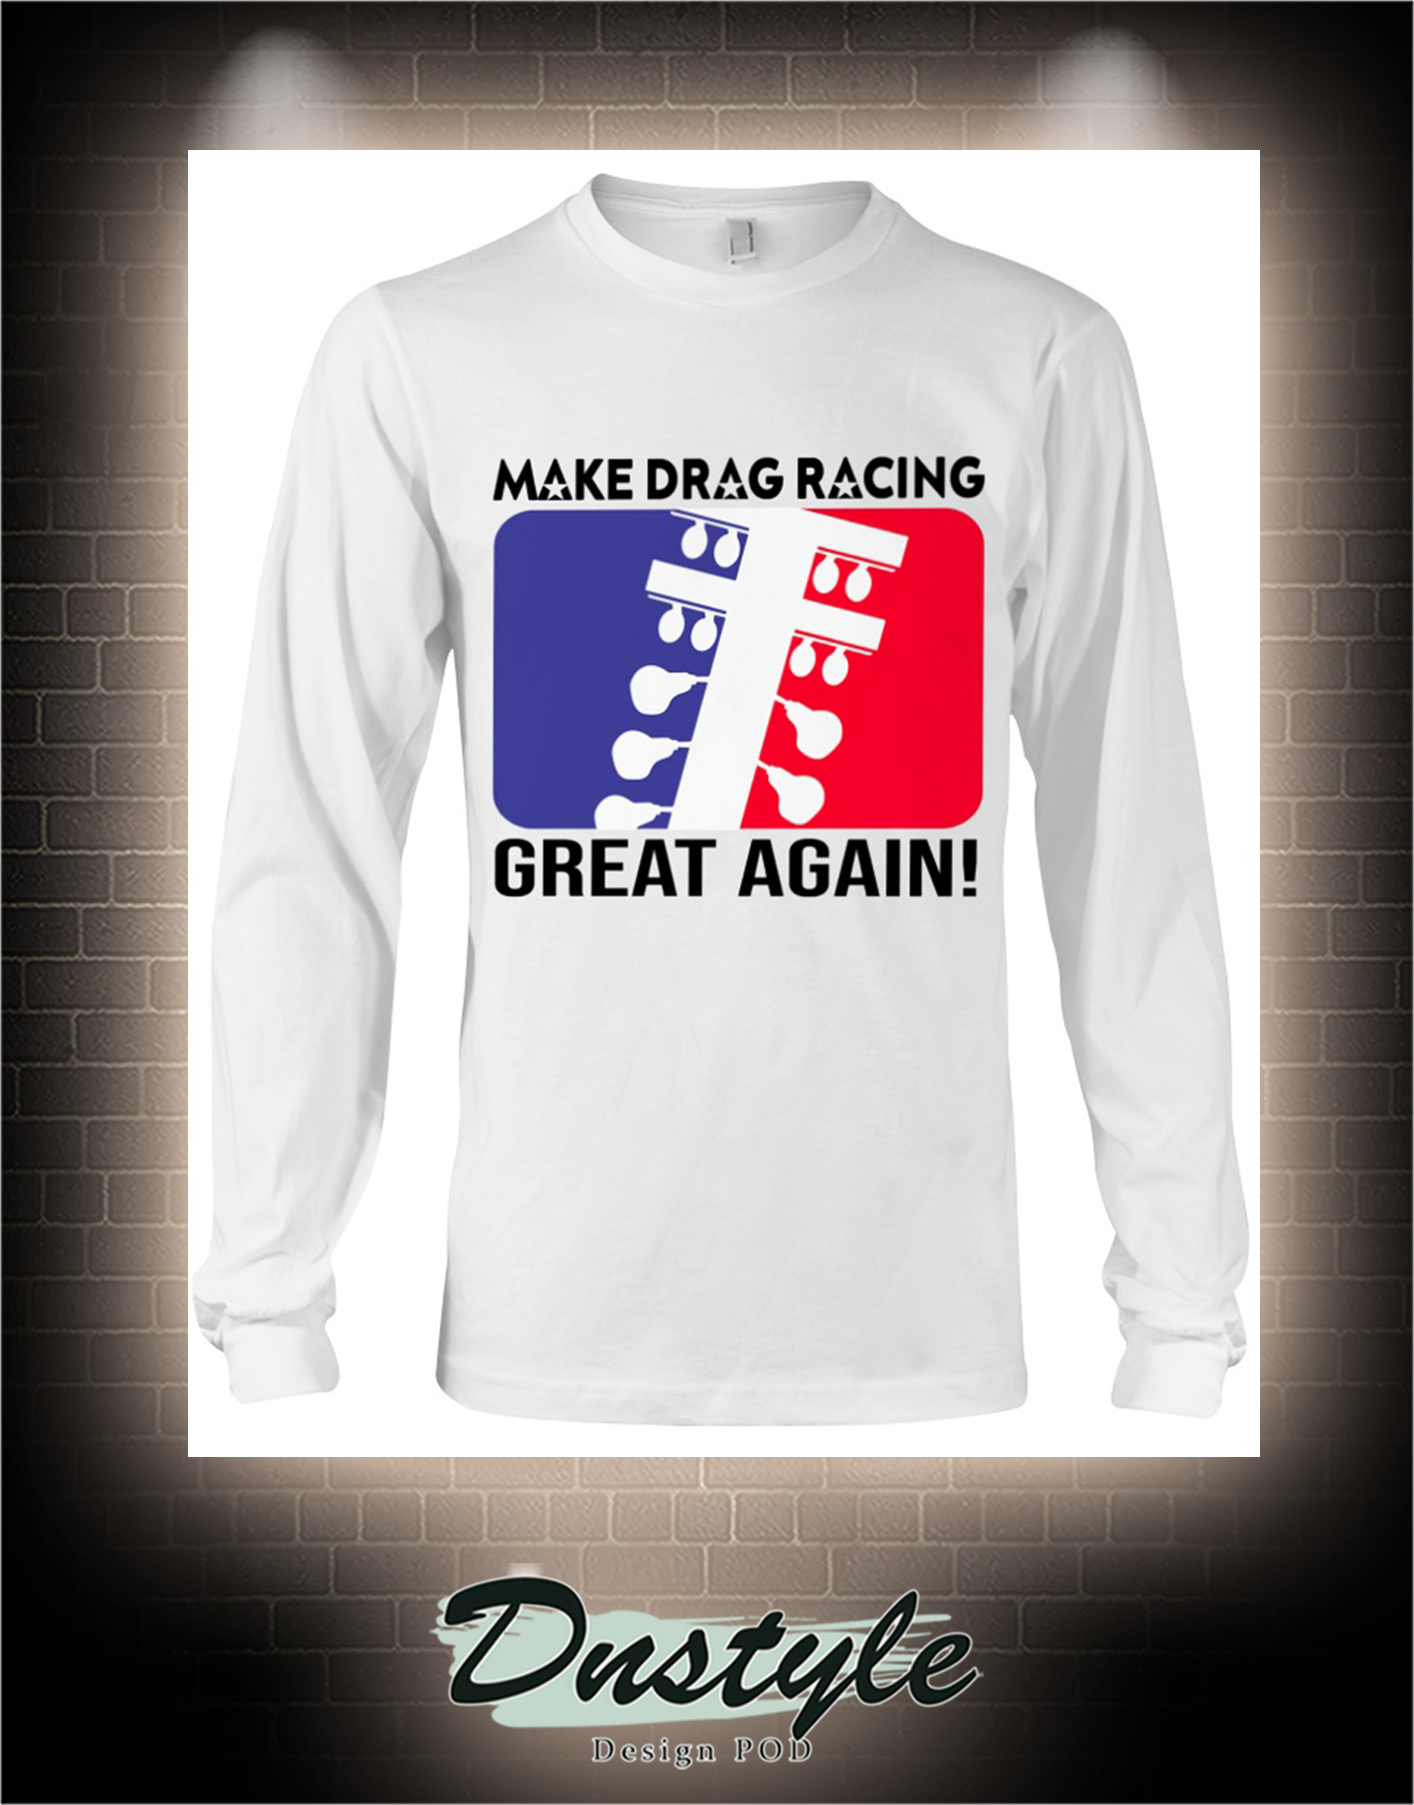 Make drag racing great again long sleeve